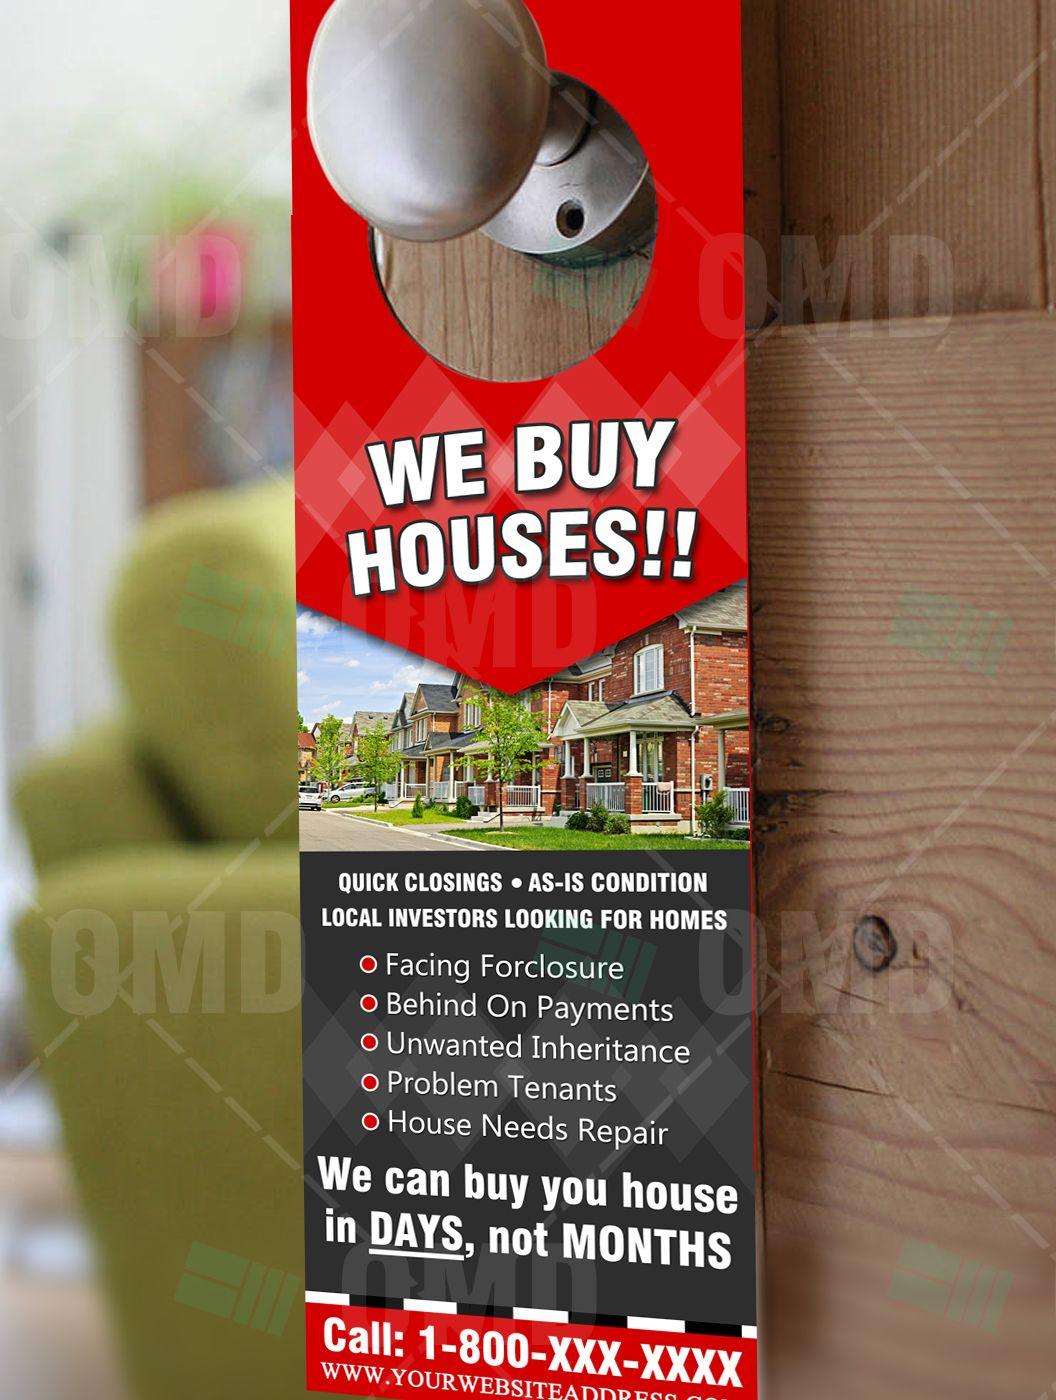 We Buy Houses Door Hanger 3 We Buy Houses Home Buying Real Estate Marketing